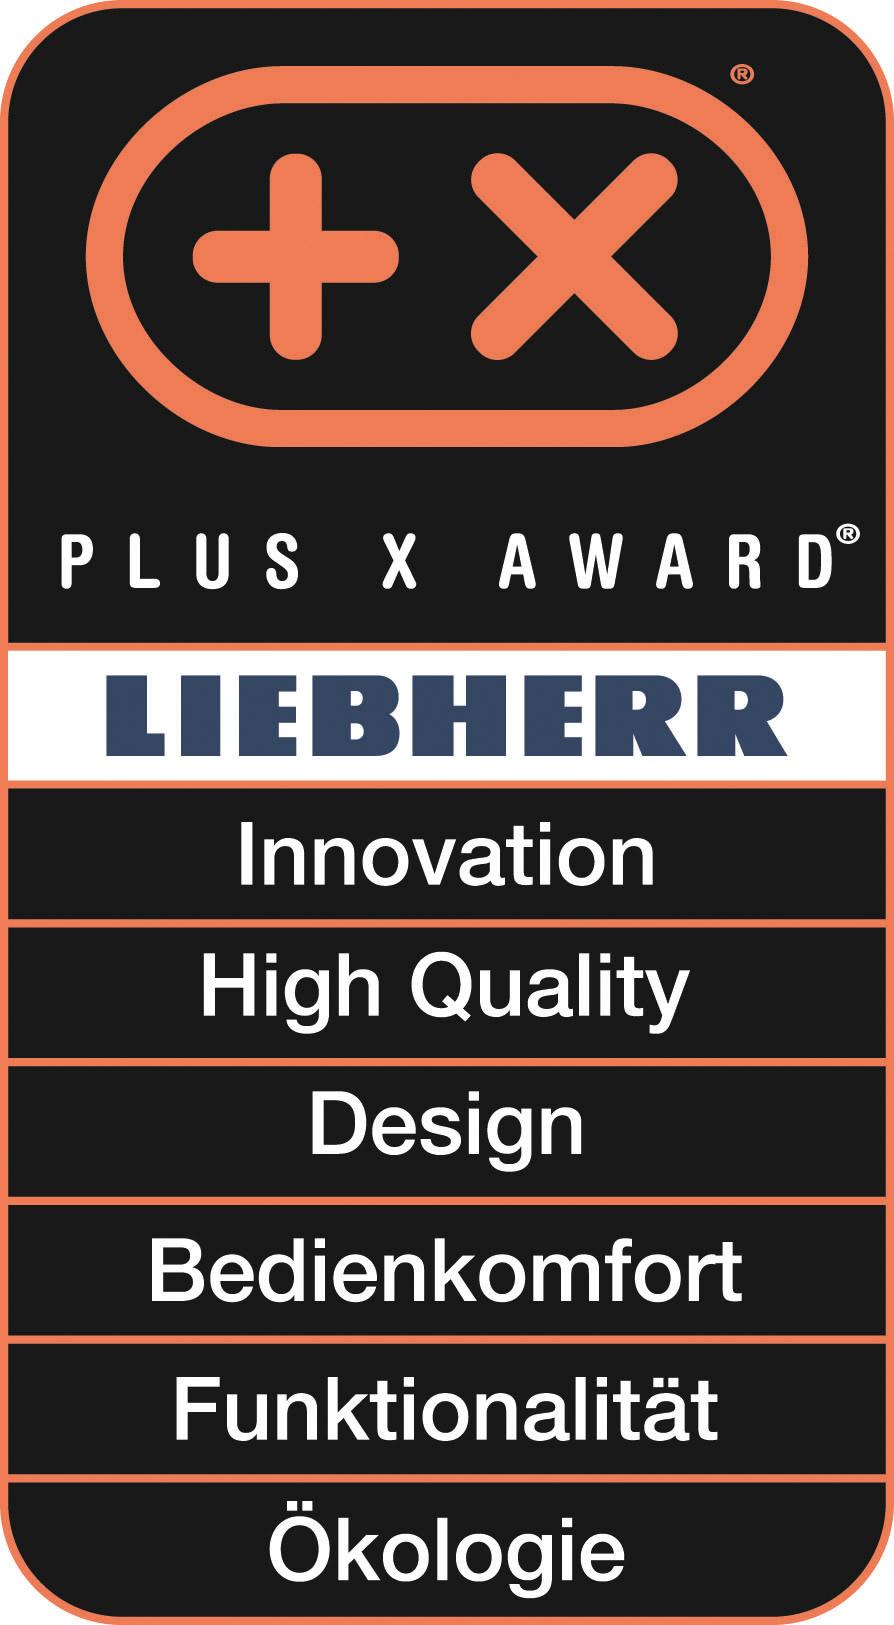 Plus X Award 2016 - Liebherr